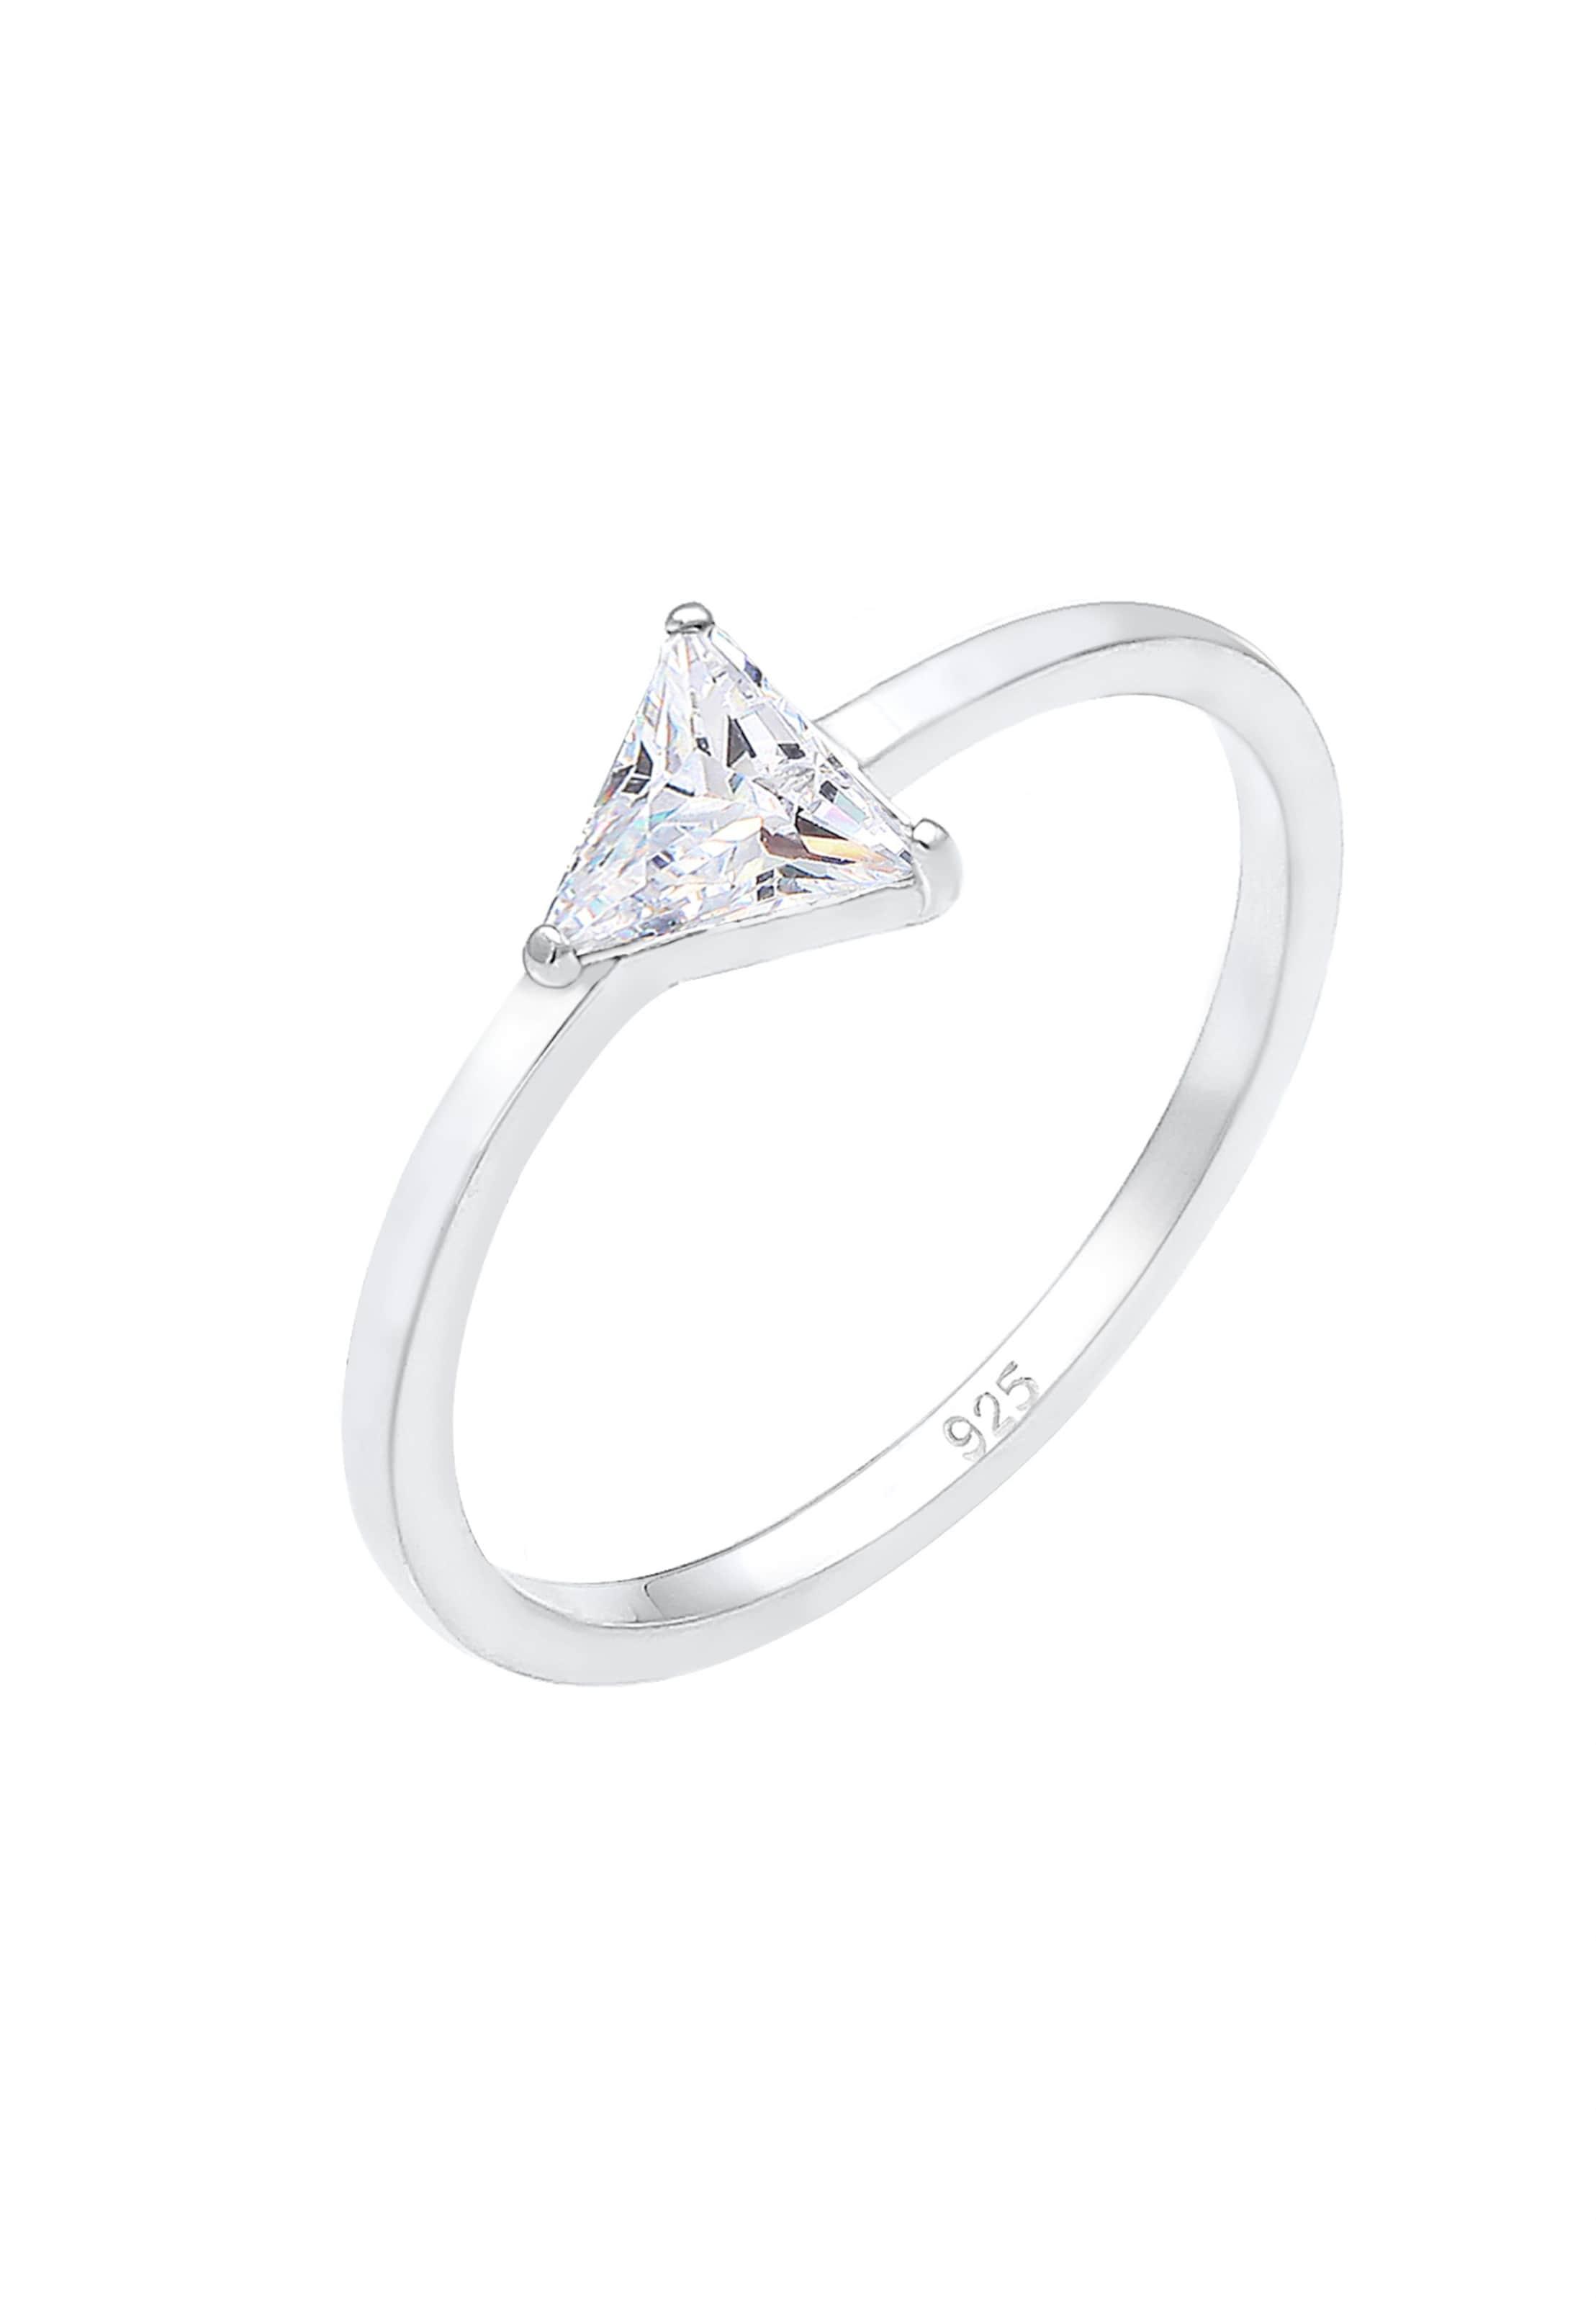 Ring In Elli 'kristall' 'kristall' In Elli Ring Silber 'kristall' Ring Silber Elli 3jL54ARq